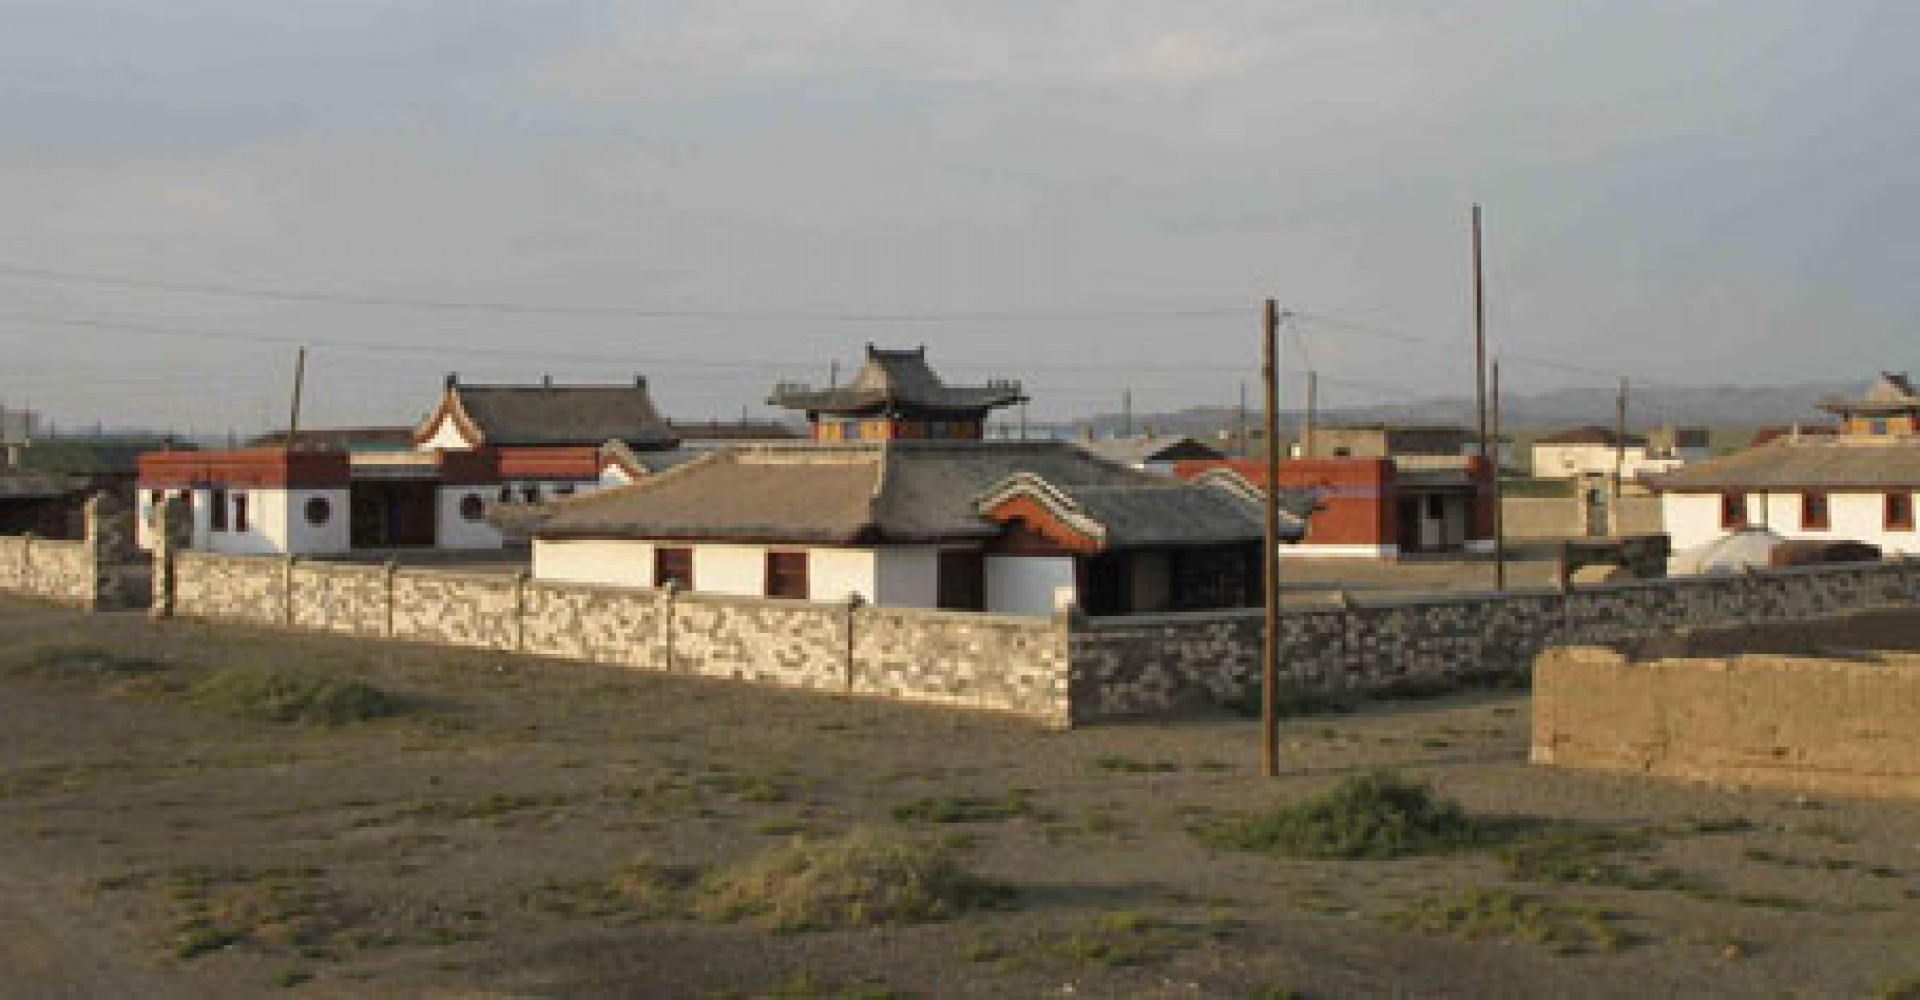 Sangiin Dalai Monastery